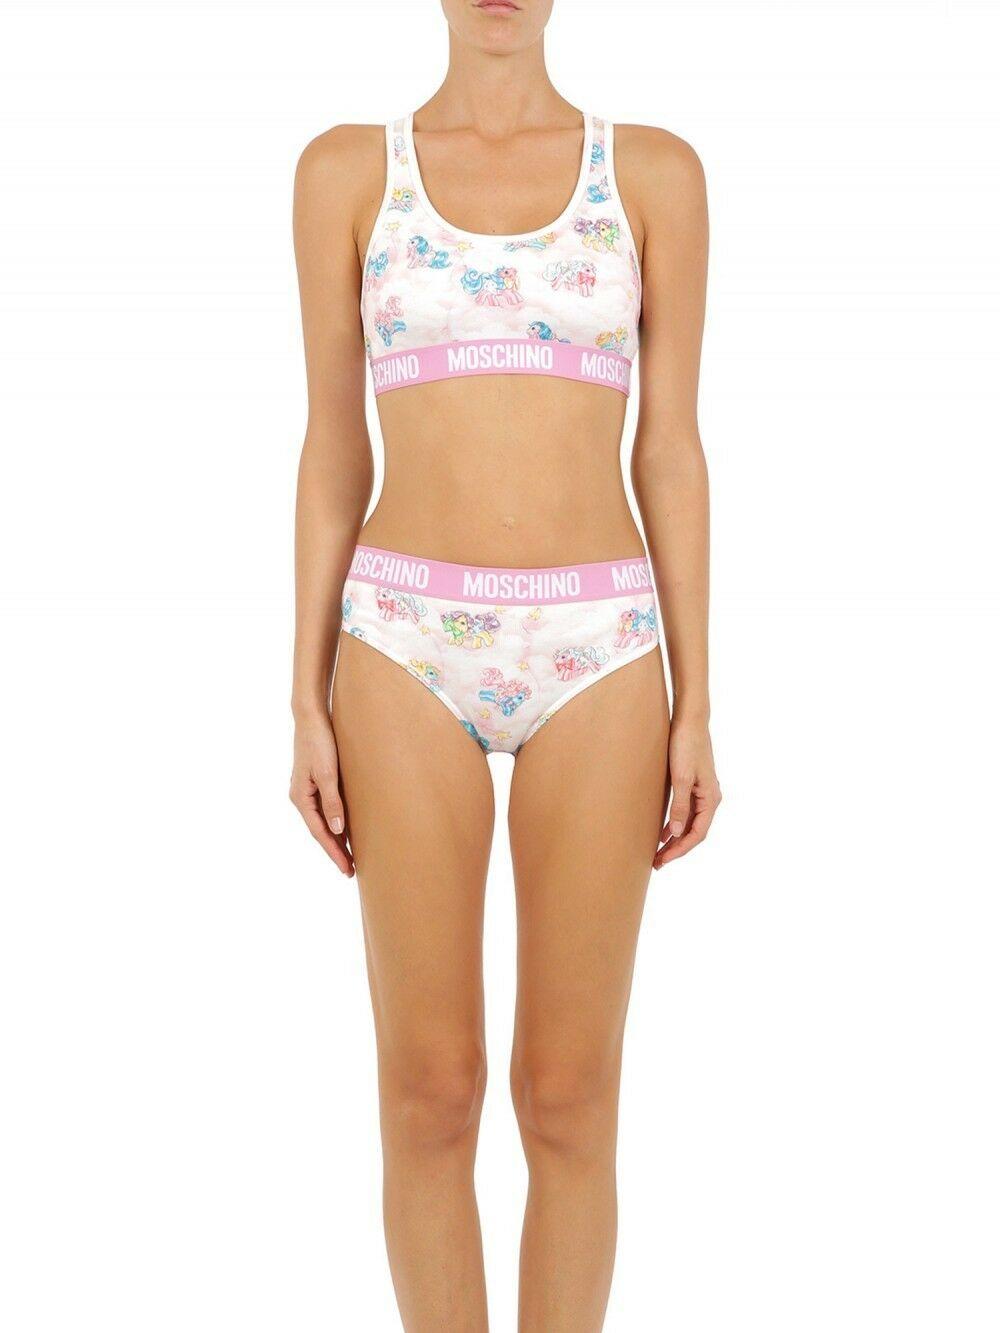 Moschino Women's Two-Piece Sleepwear Pony Bikini Multicolor TSH5089 - IT36 | XS